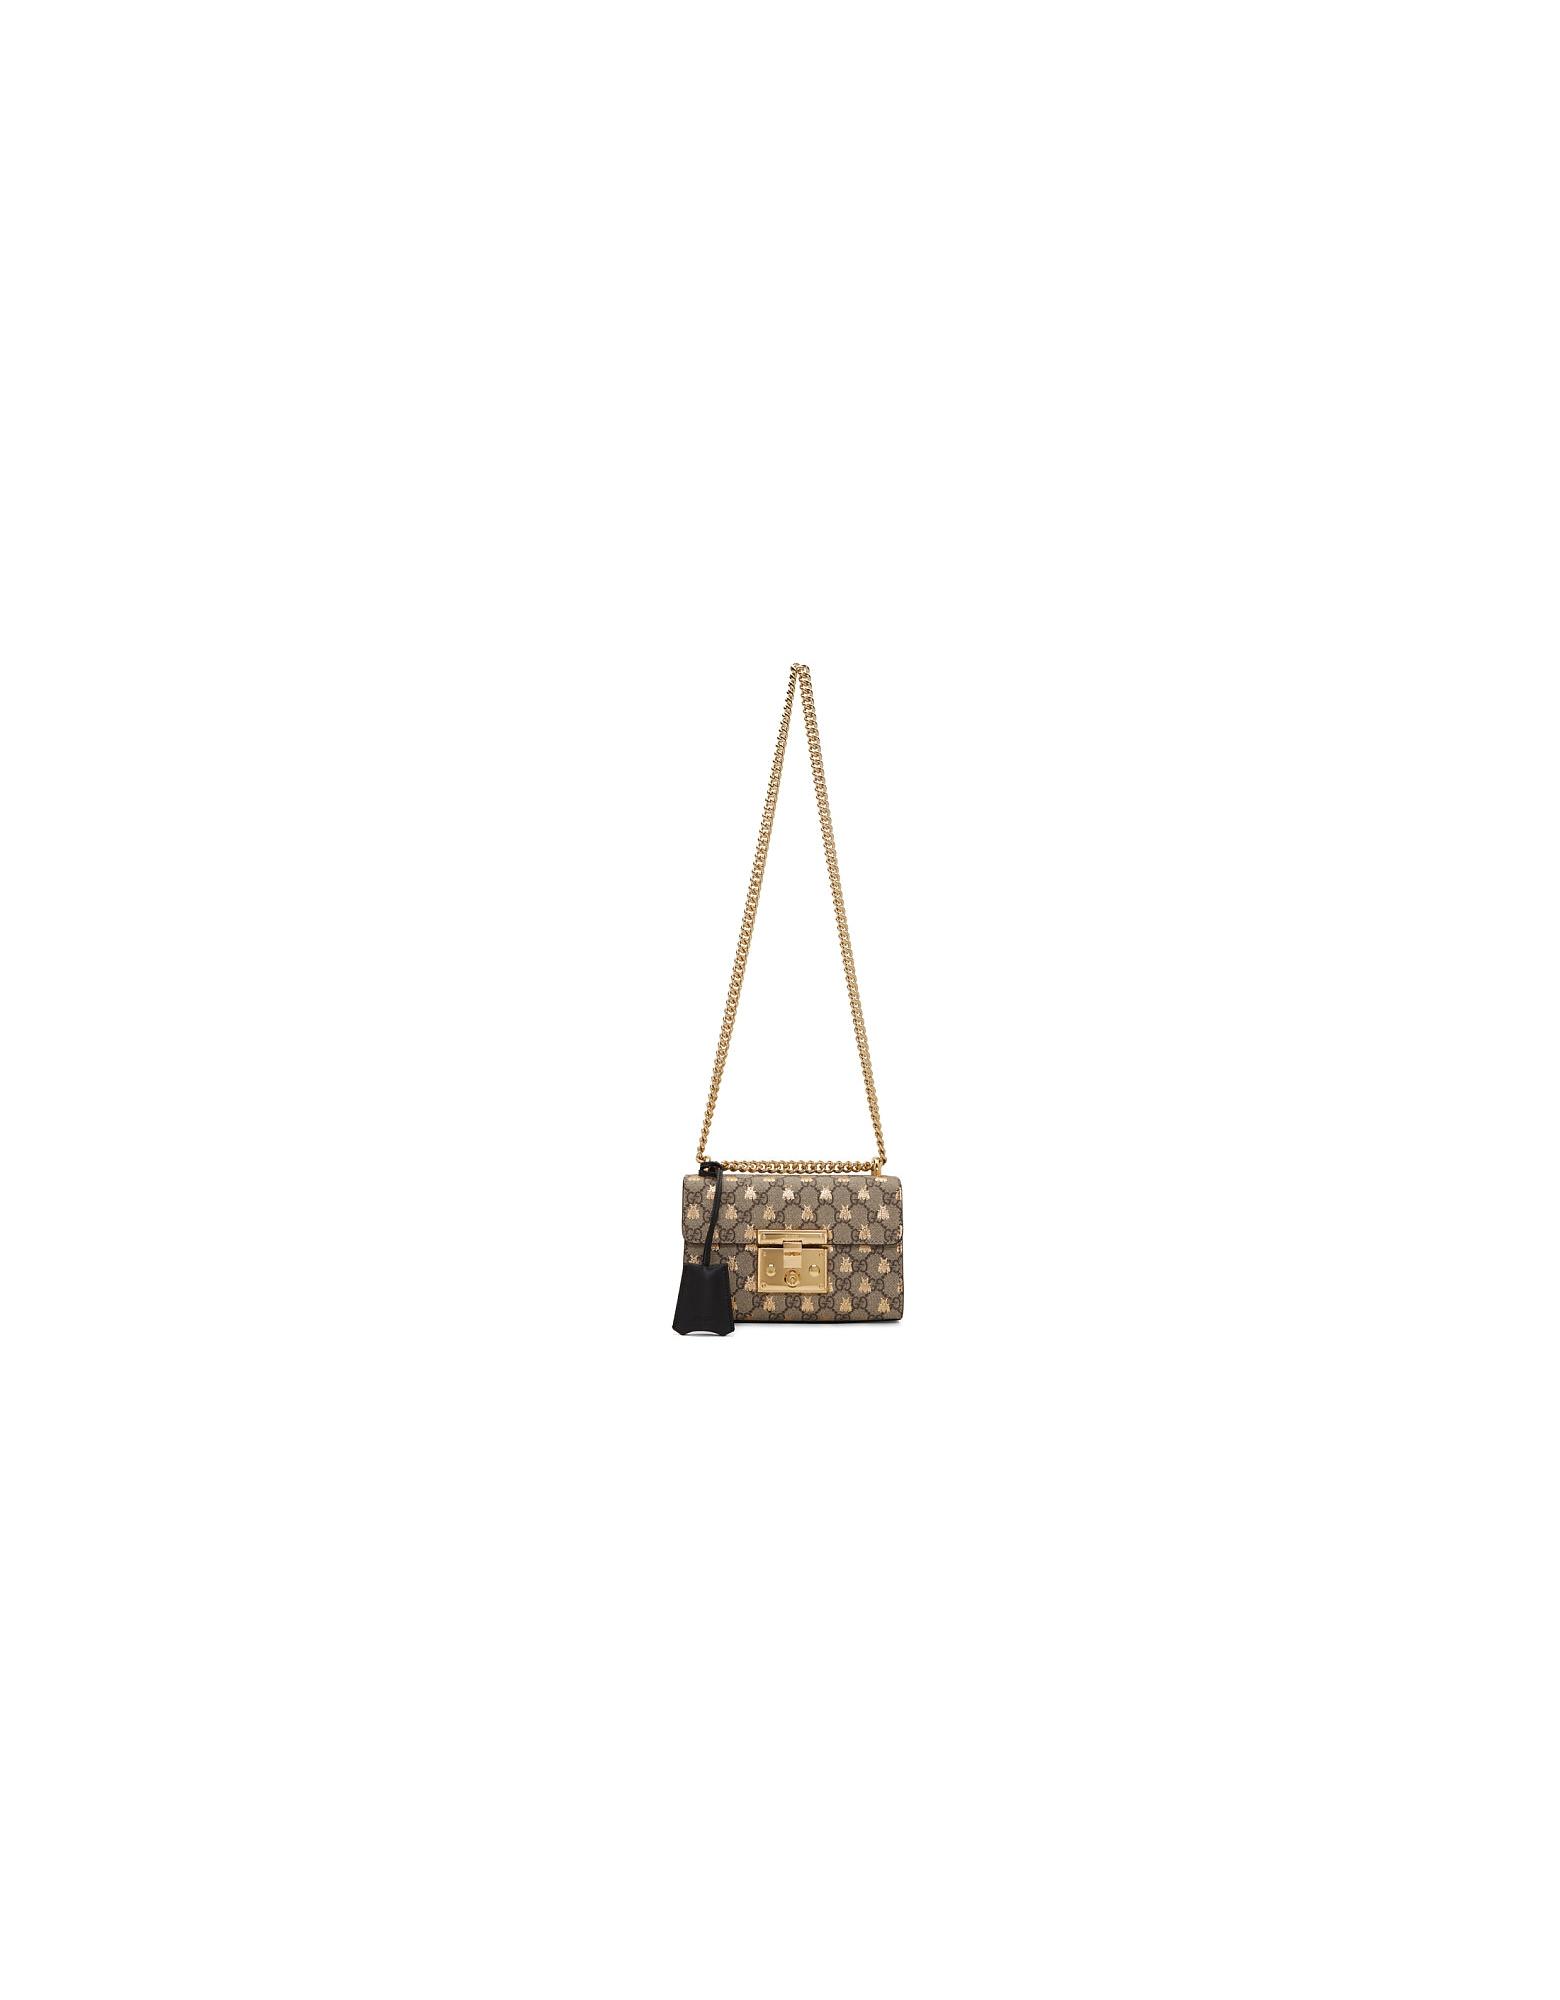 Gucci Designer Handbags, Beige Small GG Supreme Bees Padlock Bag